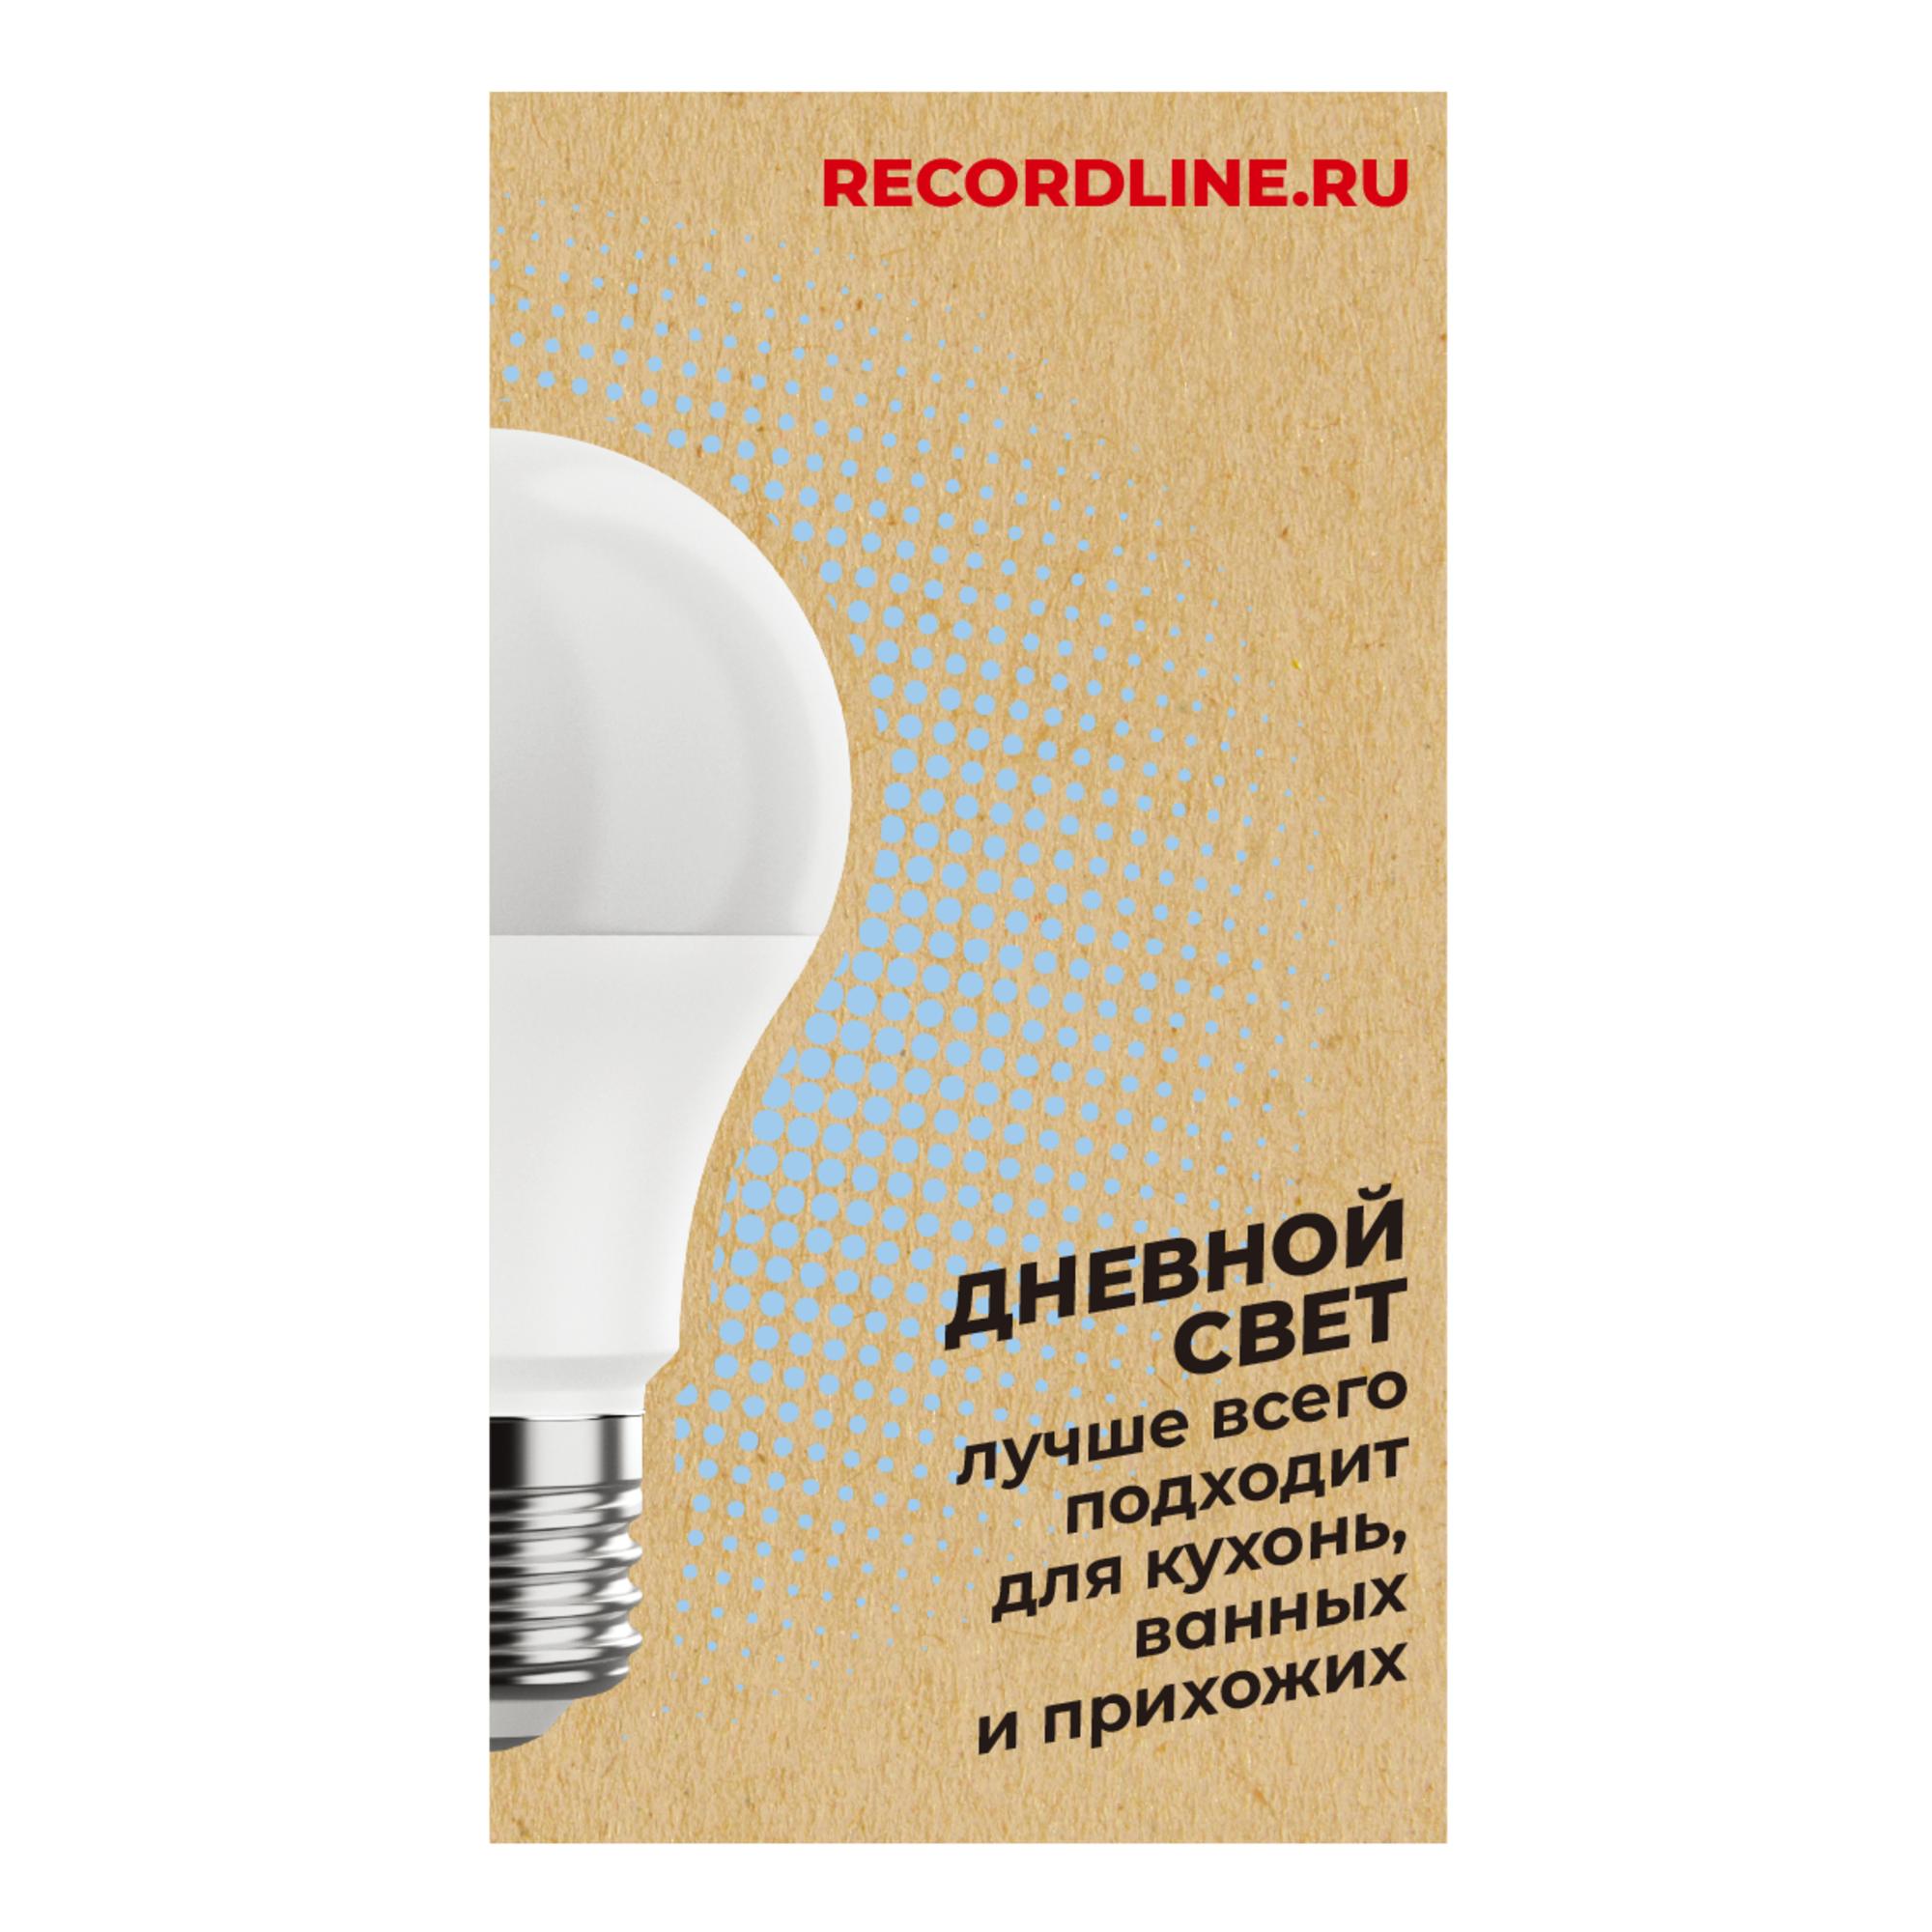 Светодиодная лампочка Рекорд 23876 E27 100 Лм 10 Вт